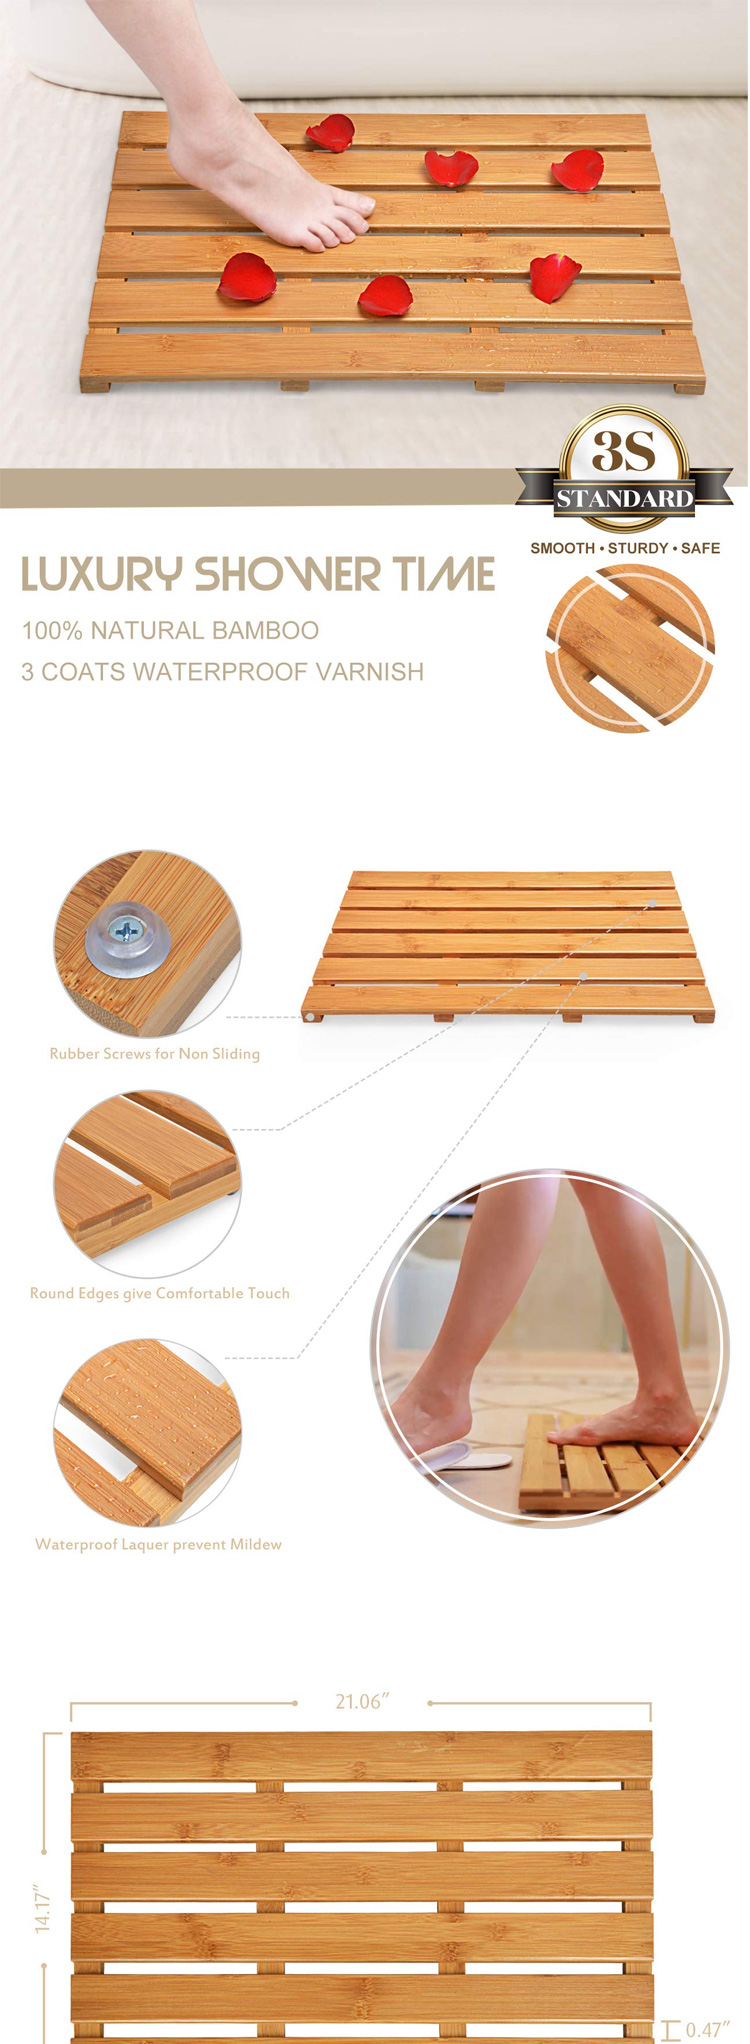 High Quality Bamboo Waterproof Bath Mat